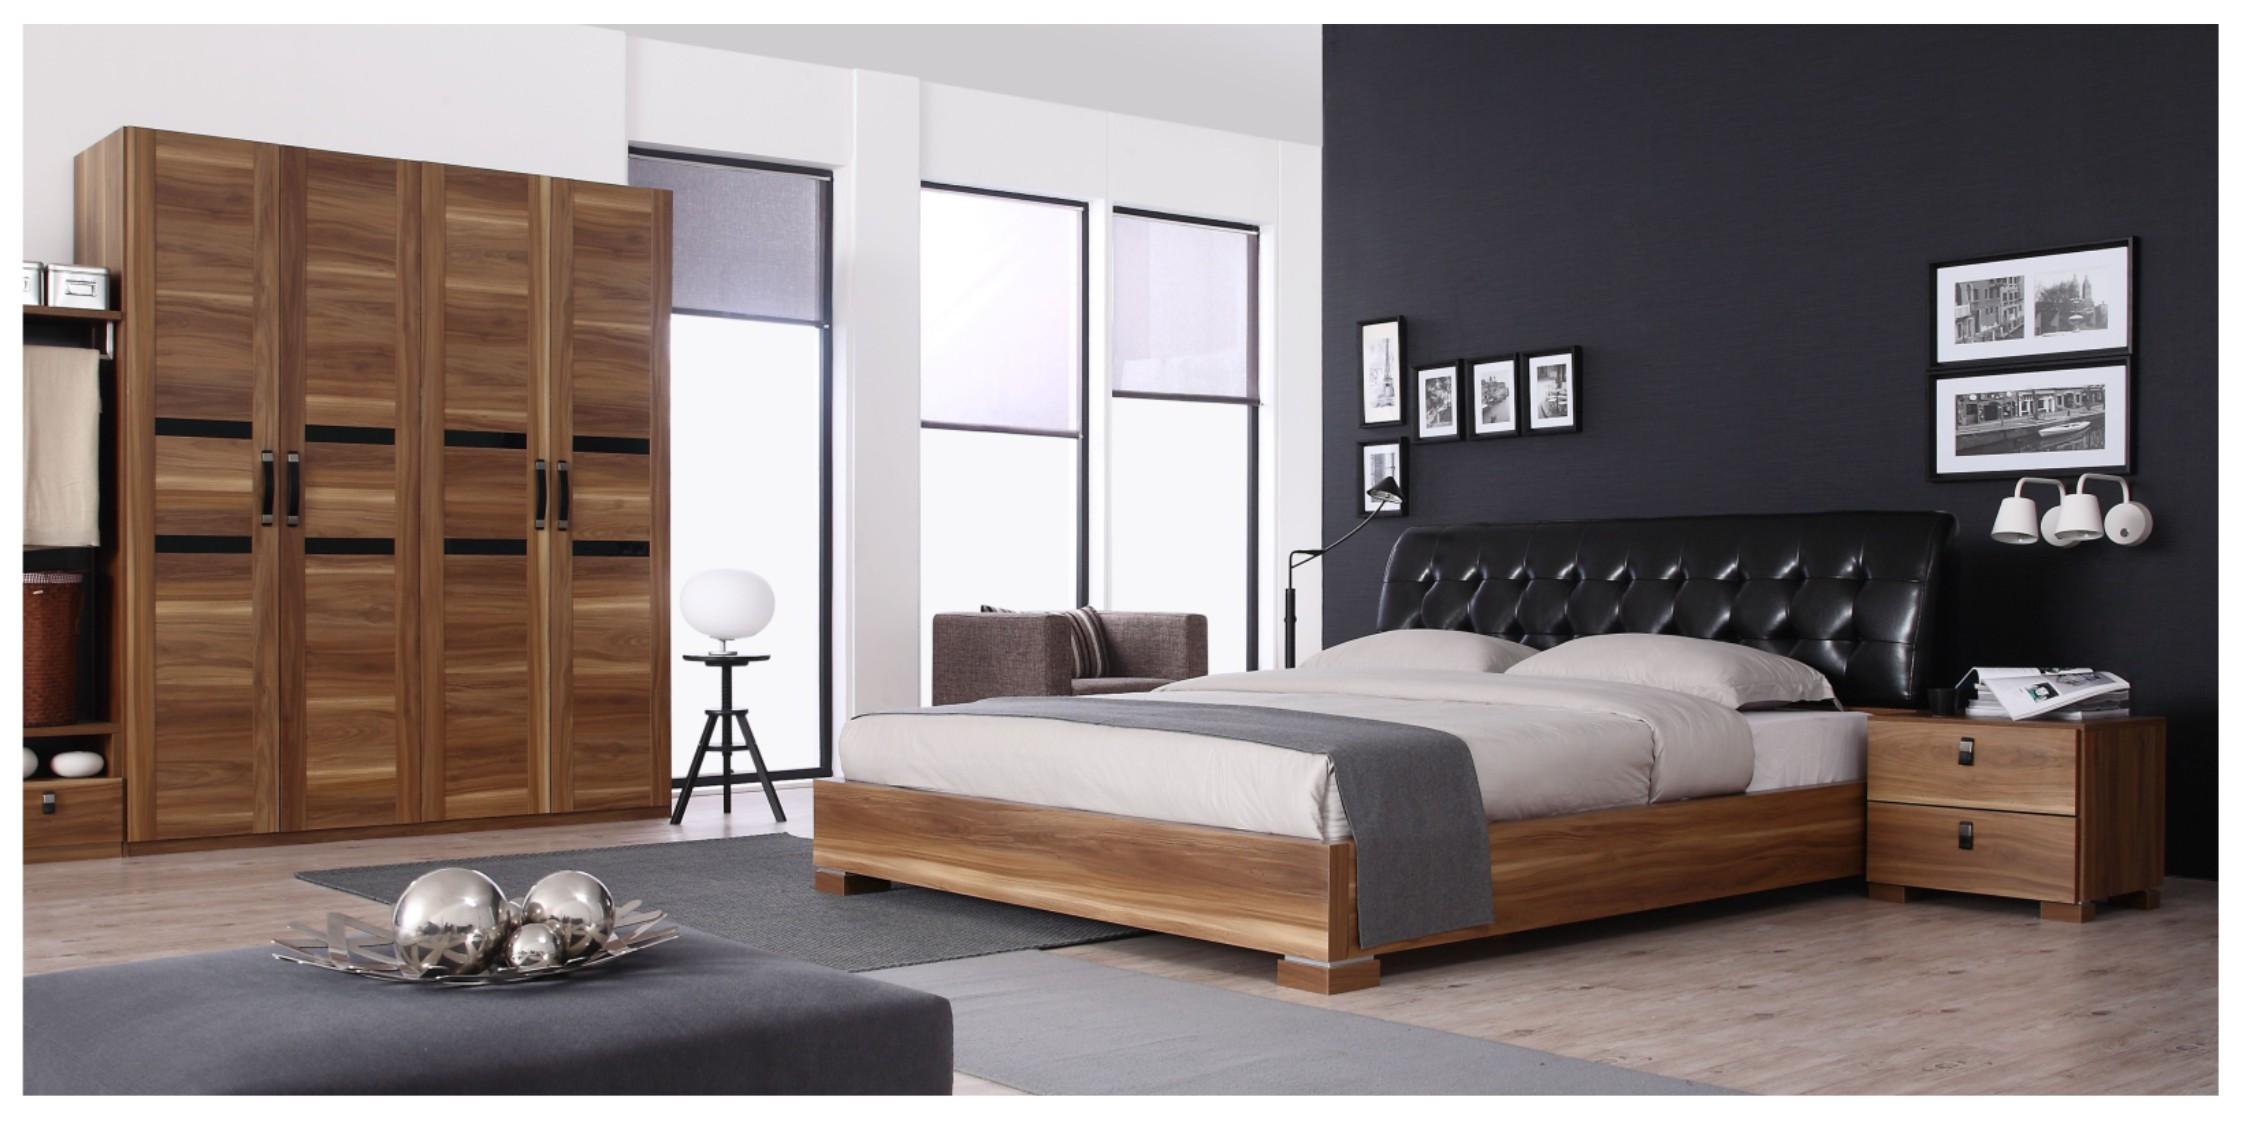 Giường ngủ D6505D